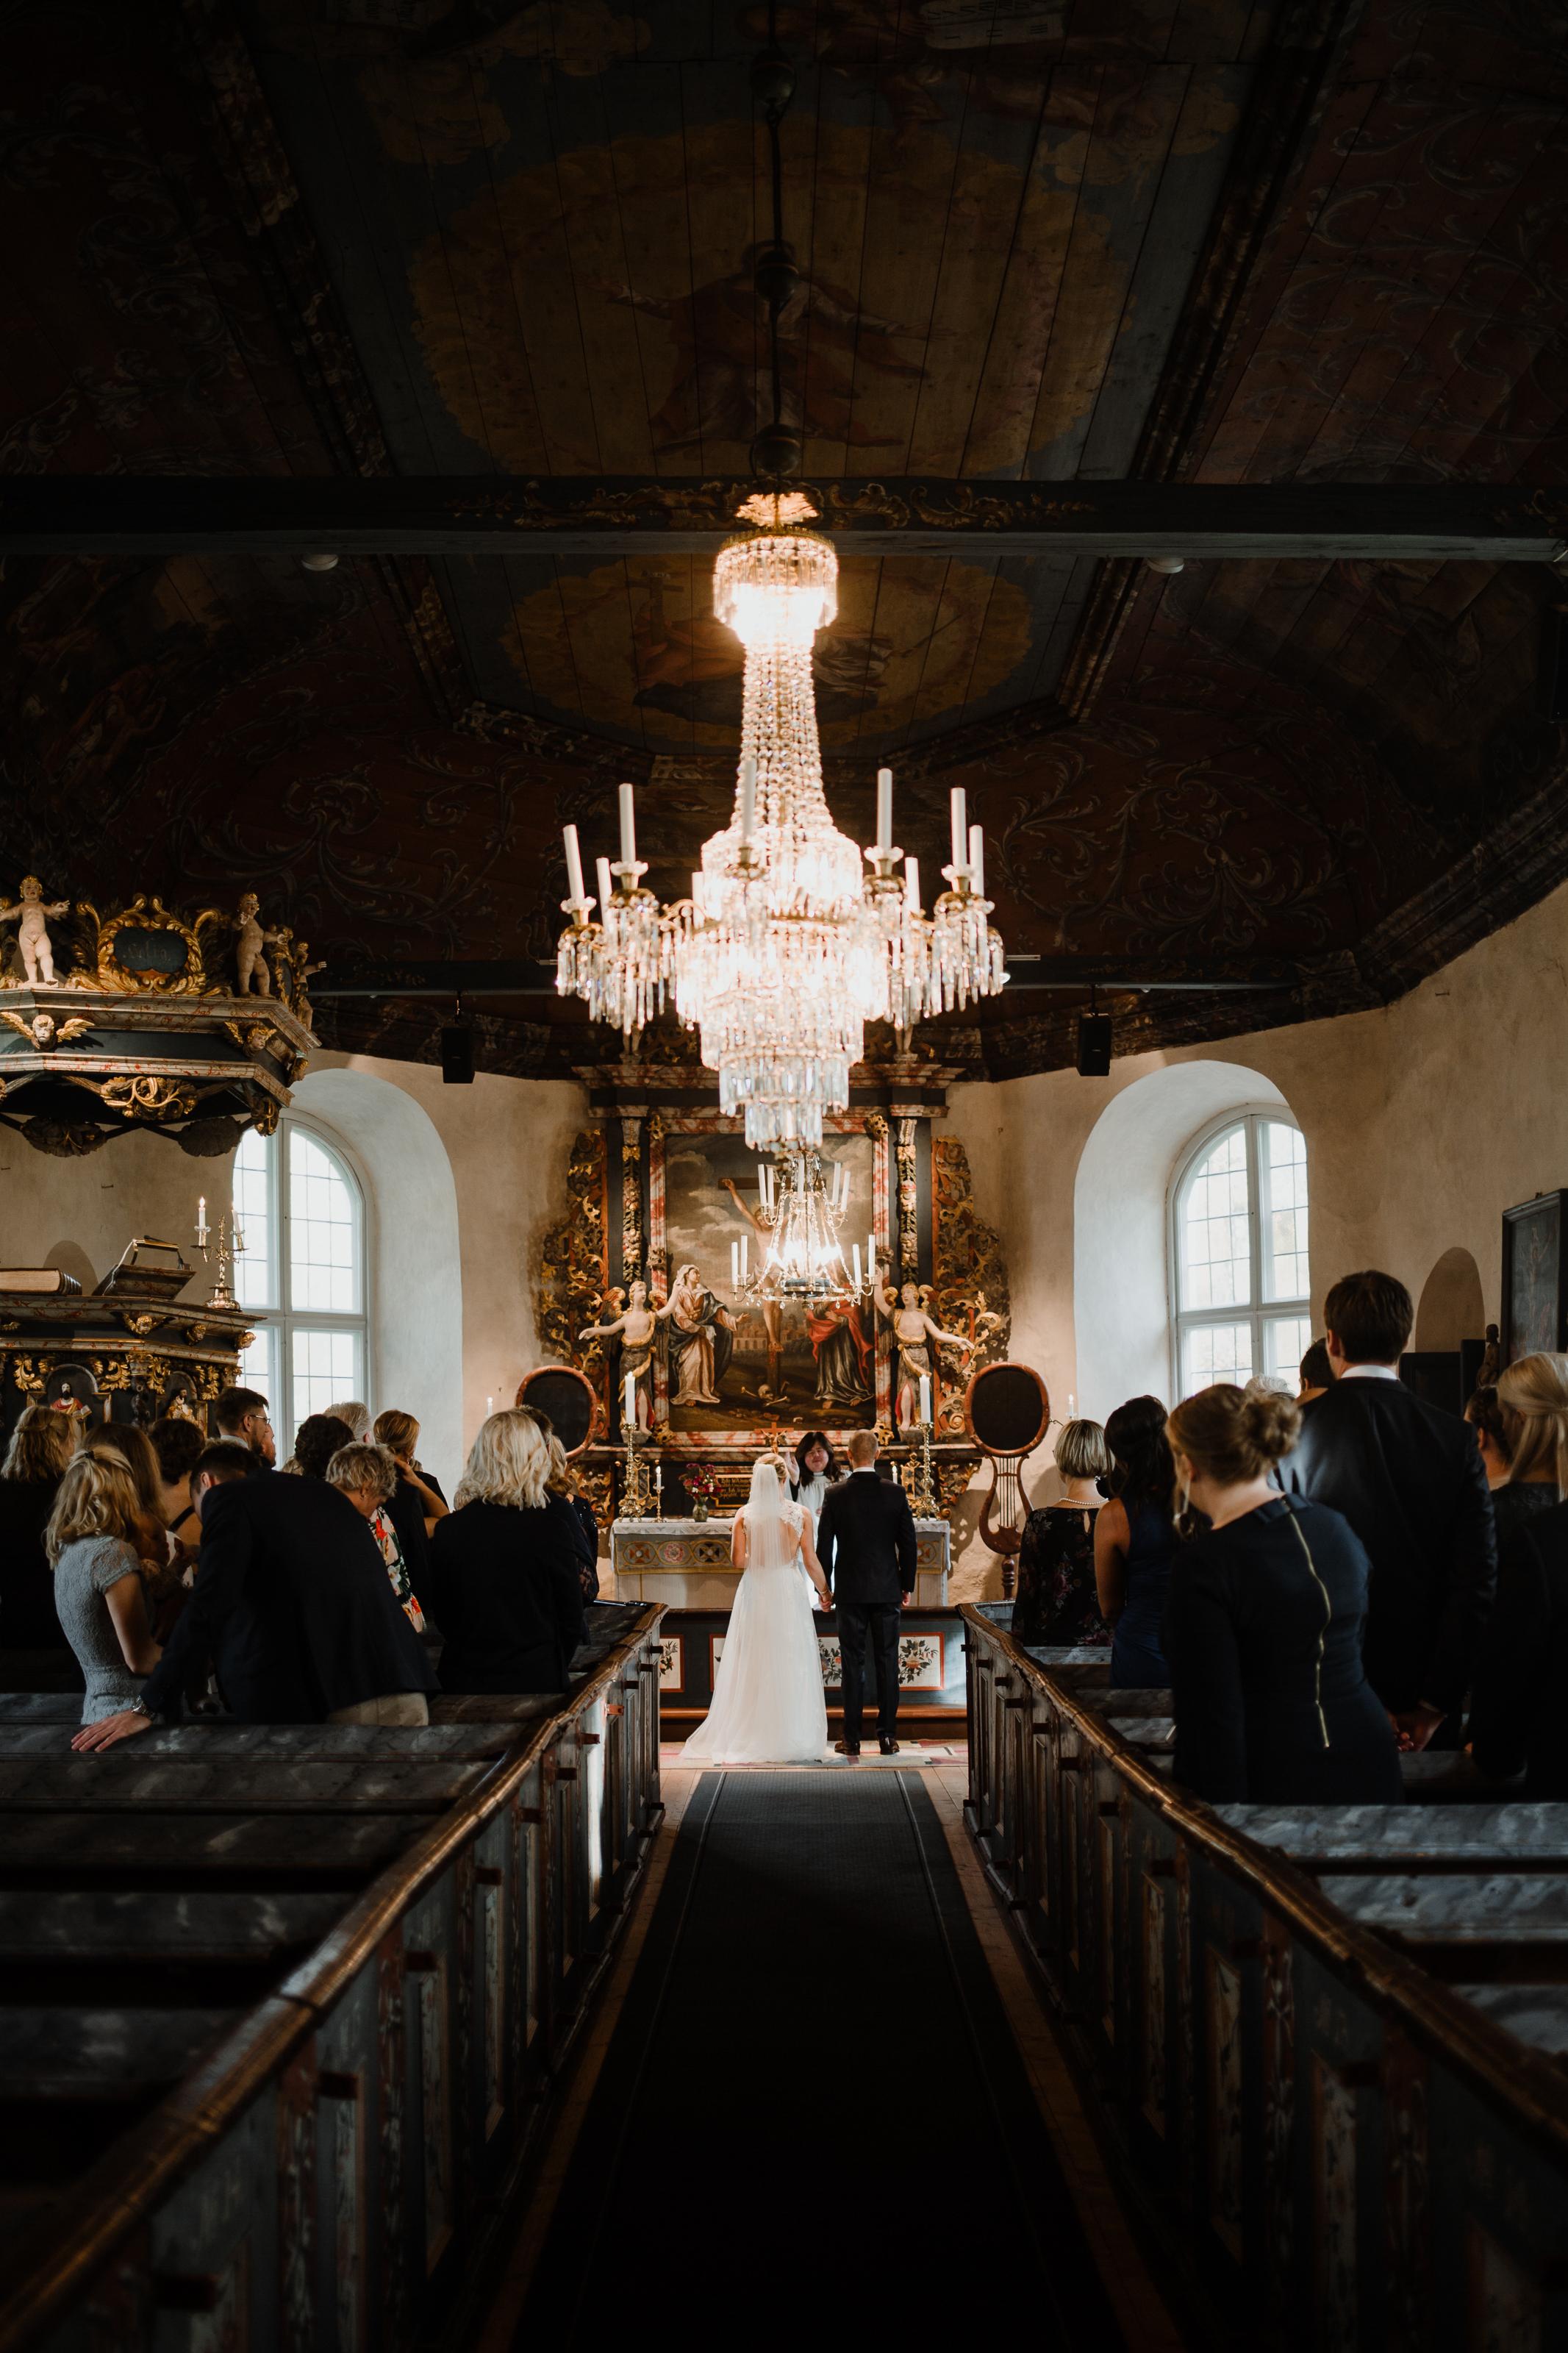 Bröllopsfotograf-Uddetorp Säteri-Höstbröllop-Fotograf Emilia- Bröllopsfotograf Borås-39.jpg